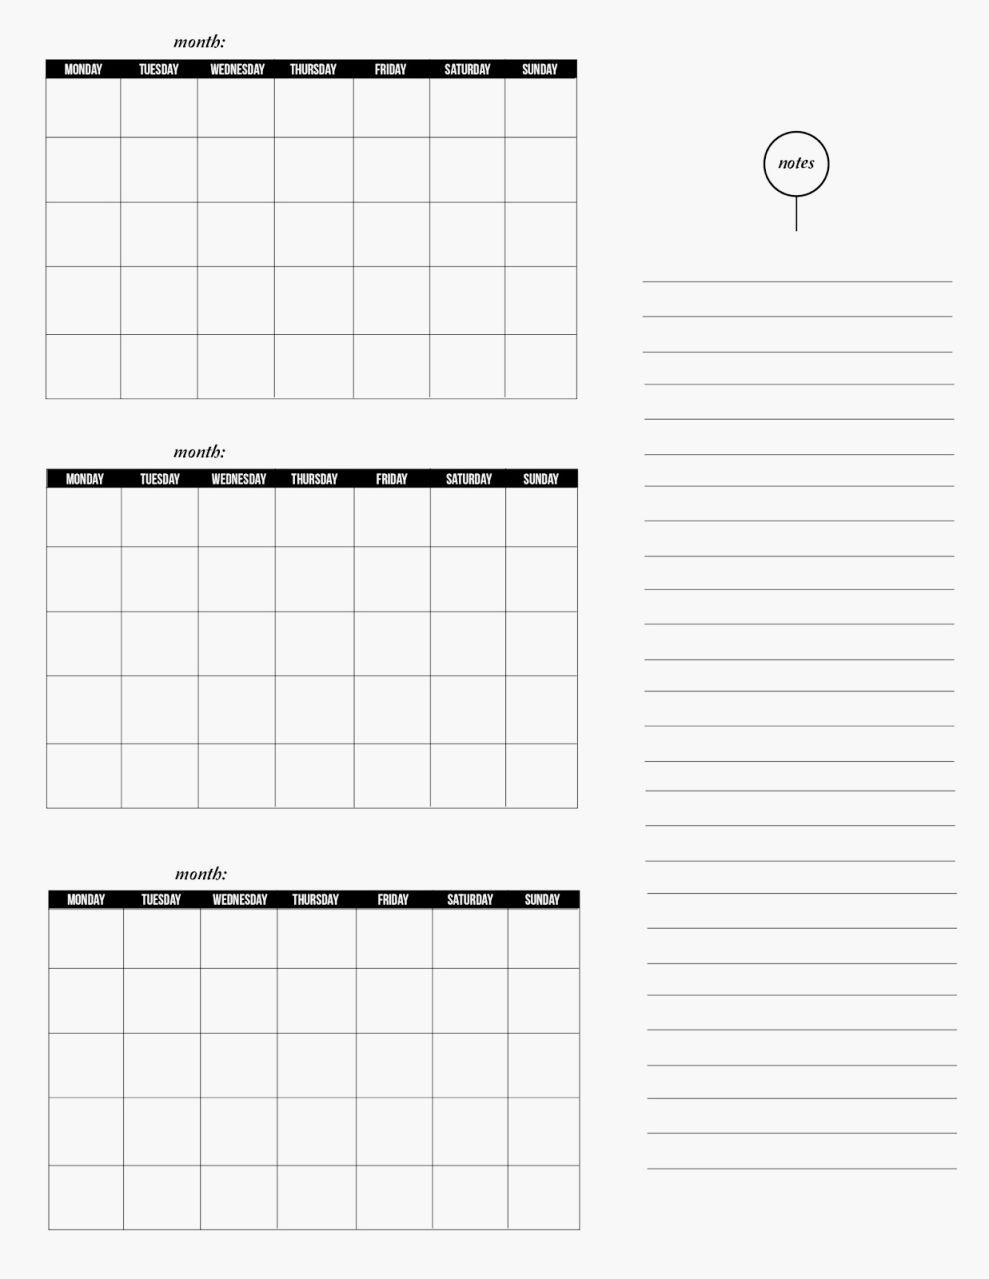 Blank Printable 3 Month Calendar | Seven Photo  Blank 3 Month Printable Calendar